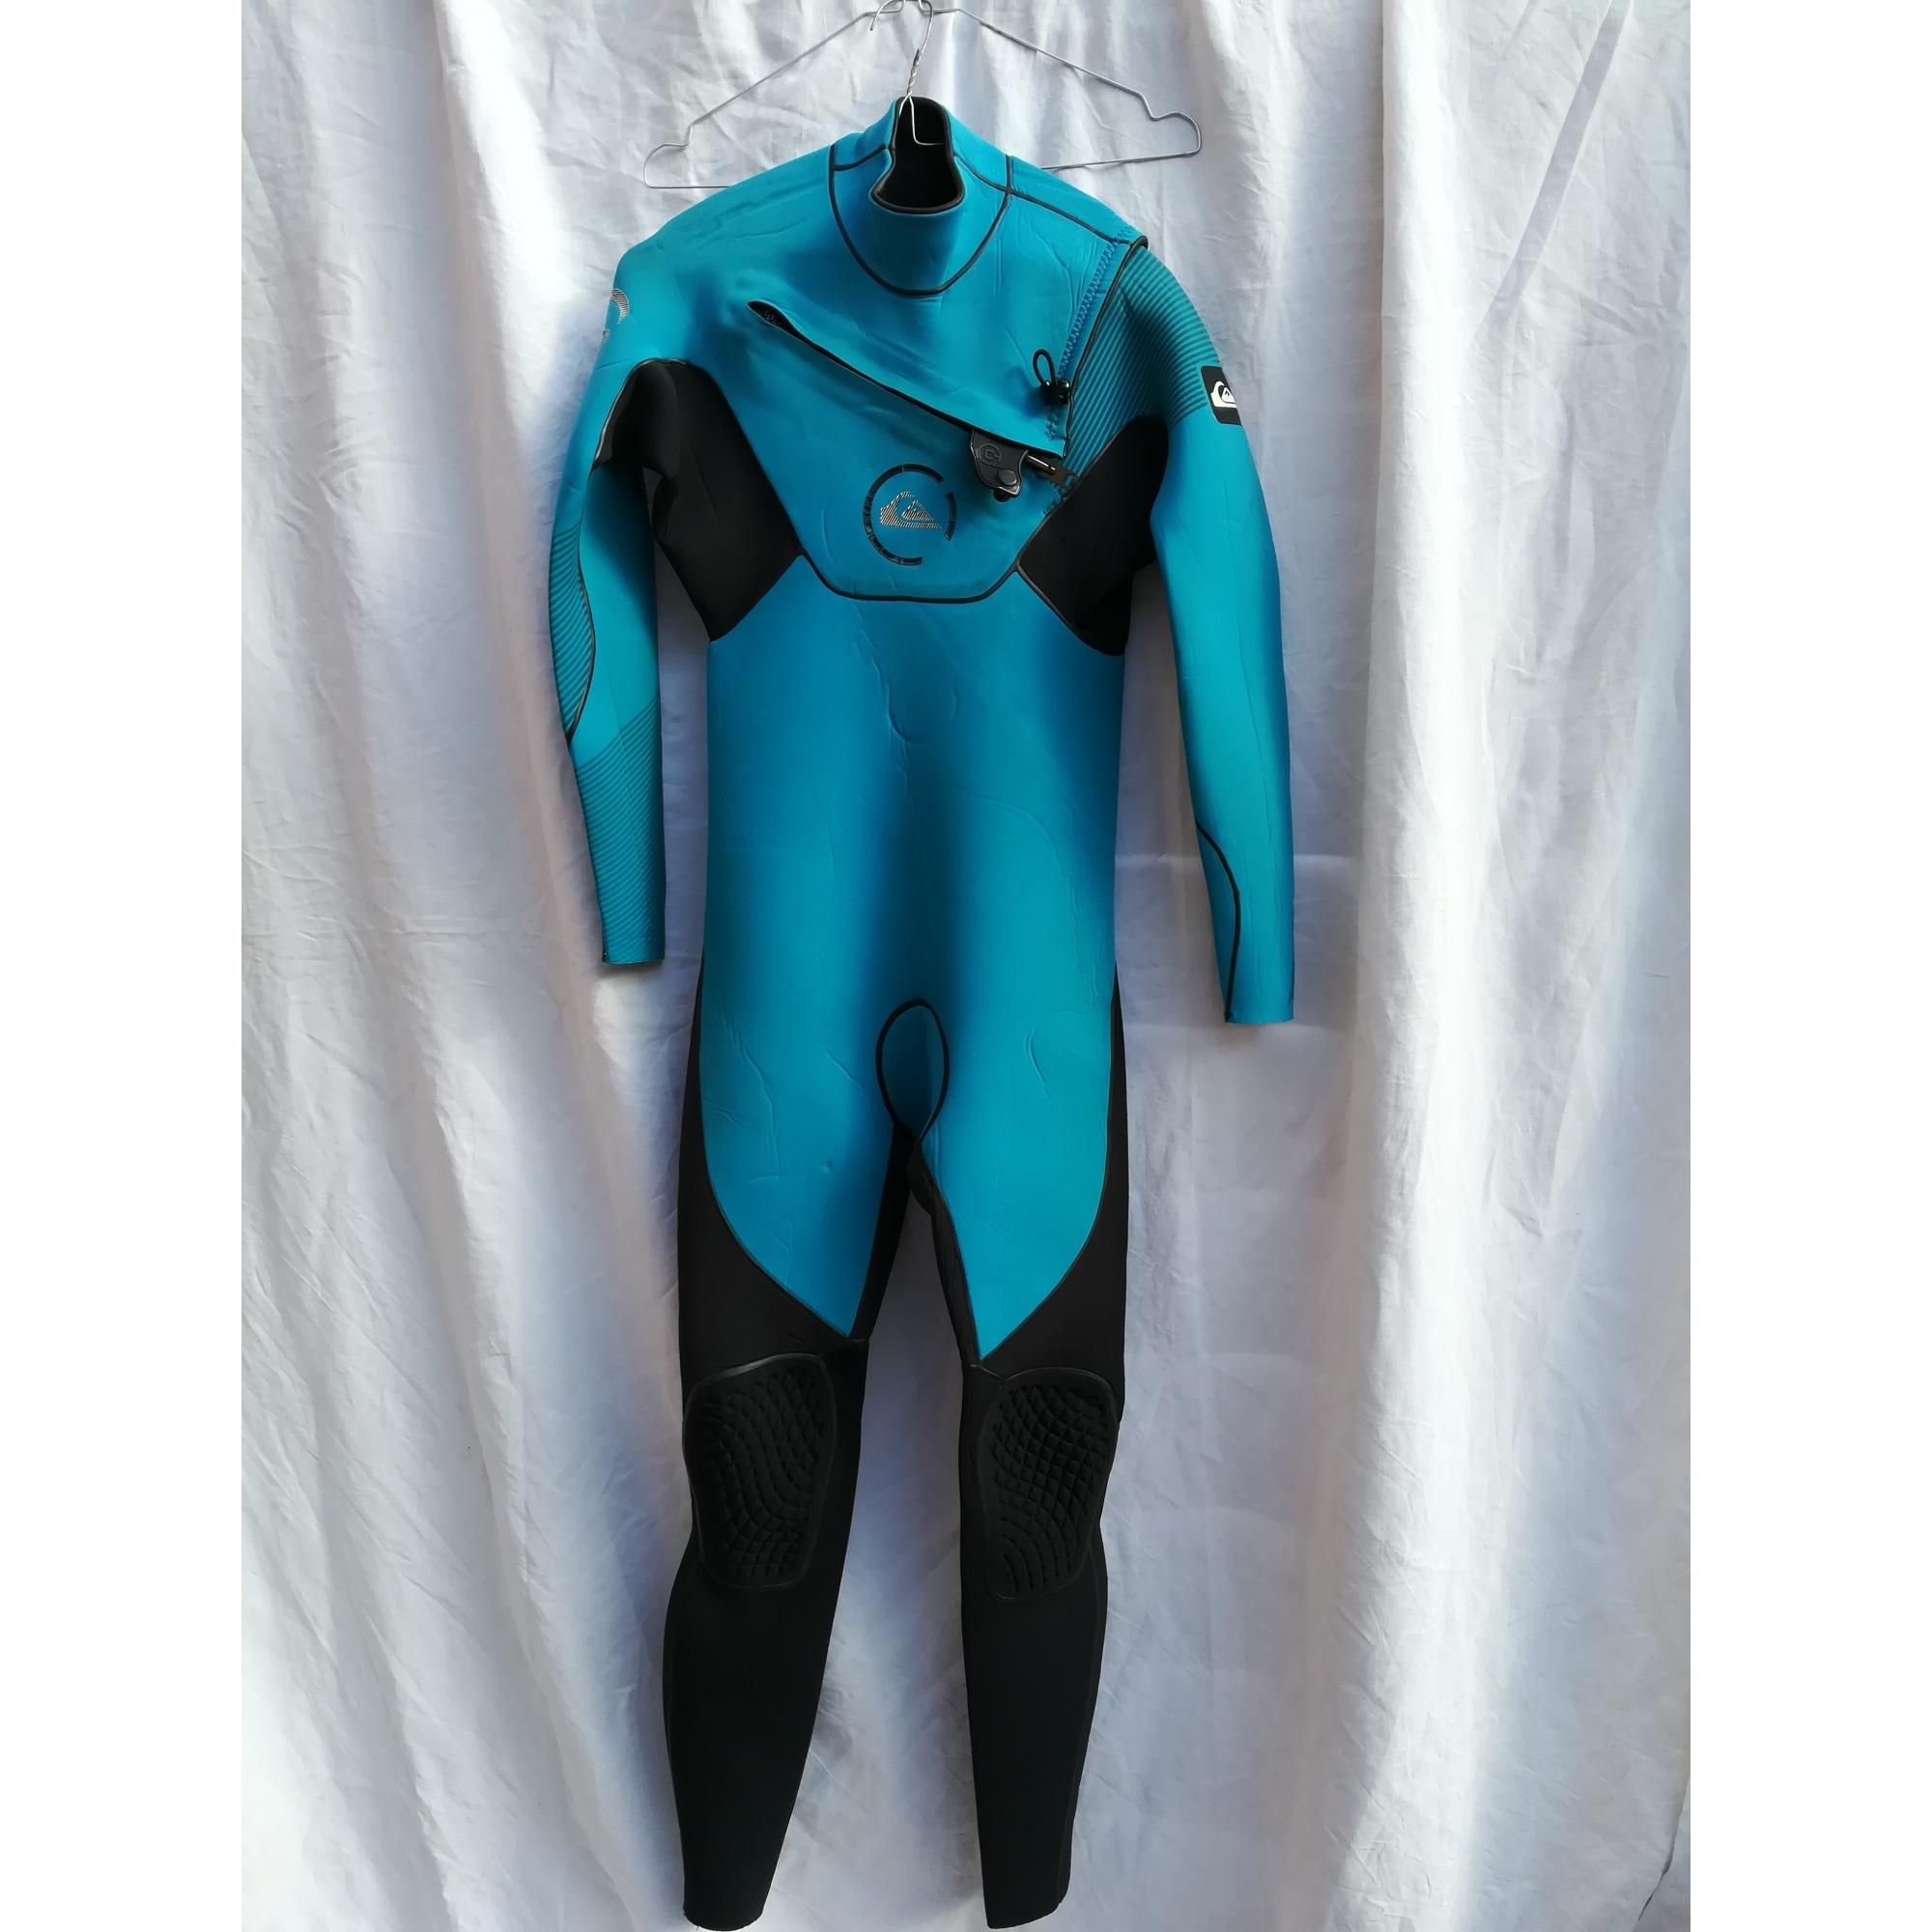 Combinaison de ski QUIKSILVER Bleu, bleu marine, bleu turquoise